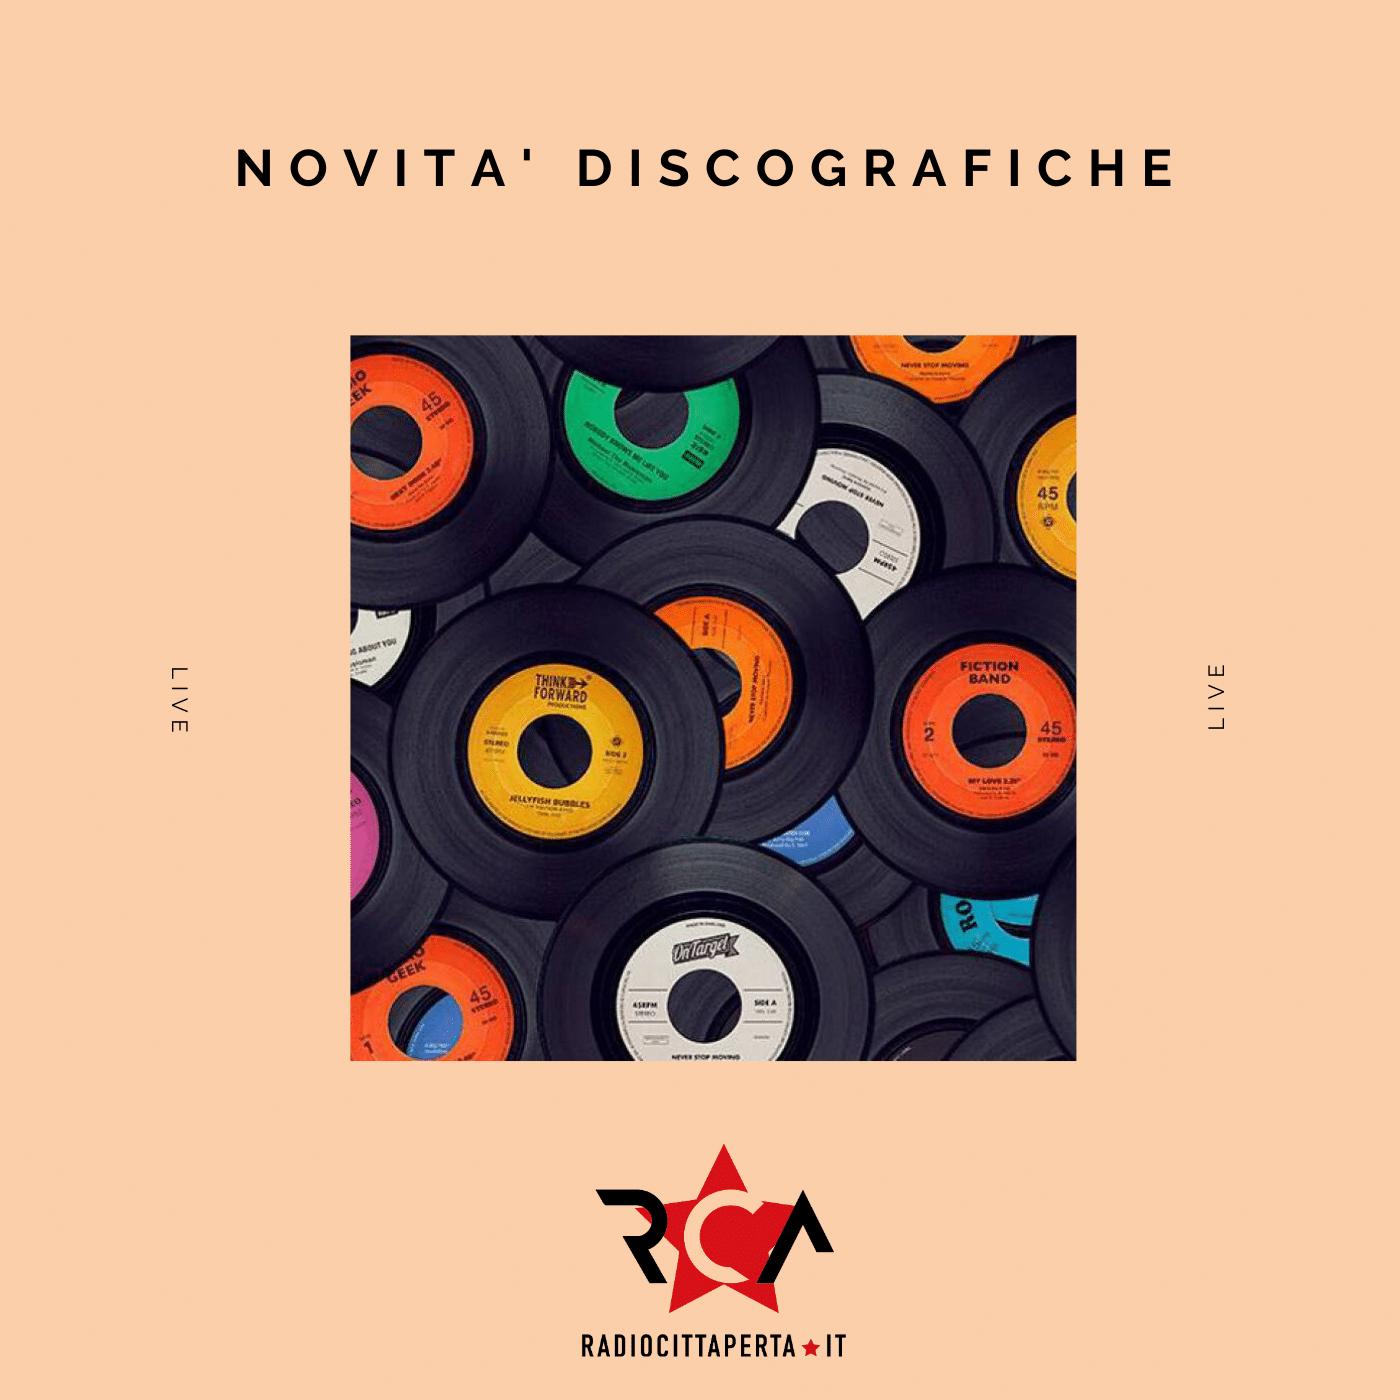 NOVITA' DISCOGRAFICHE